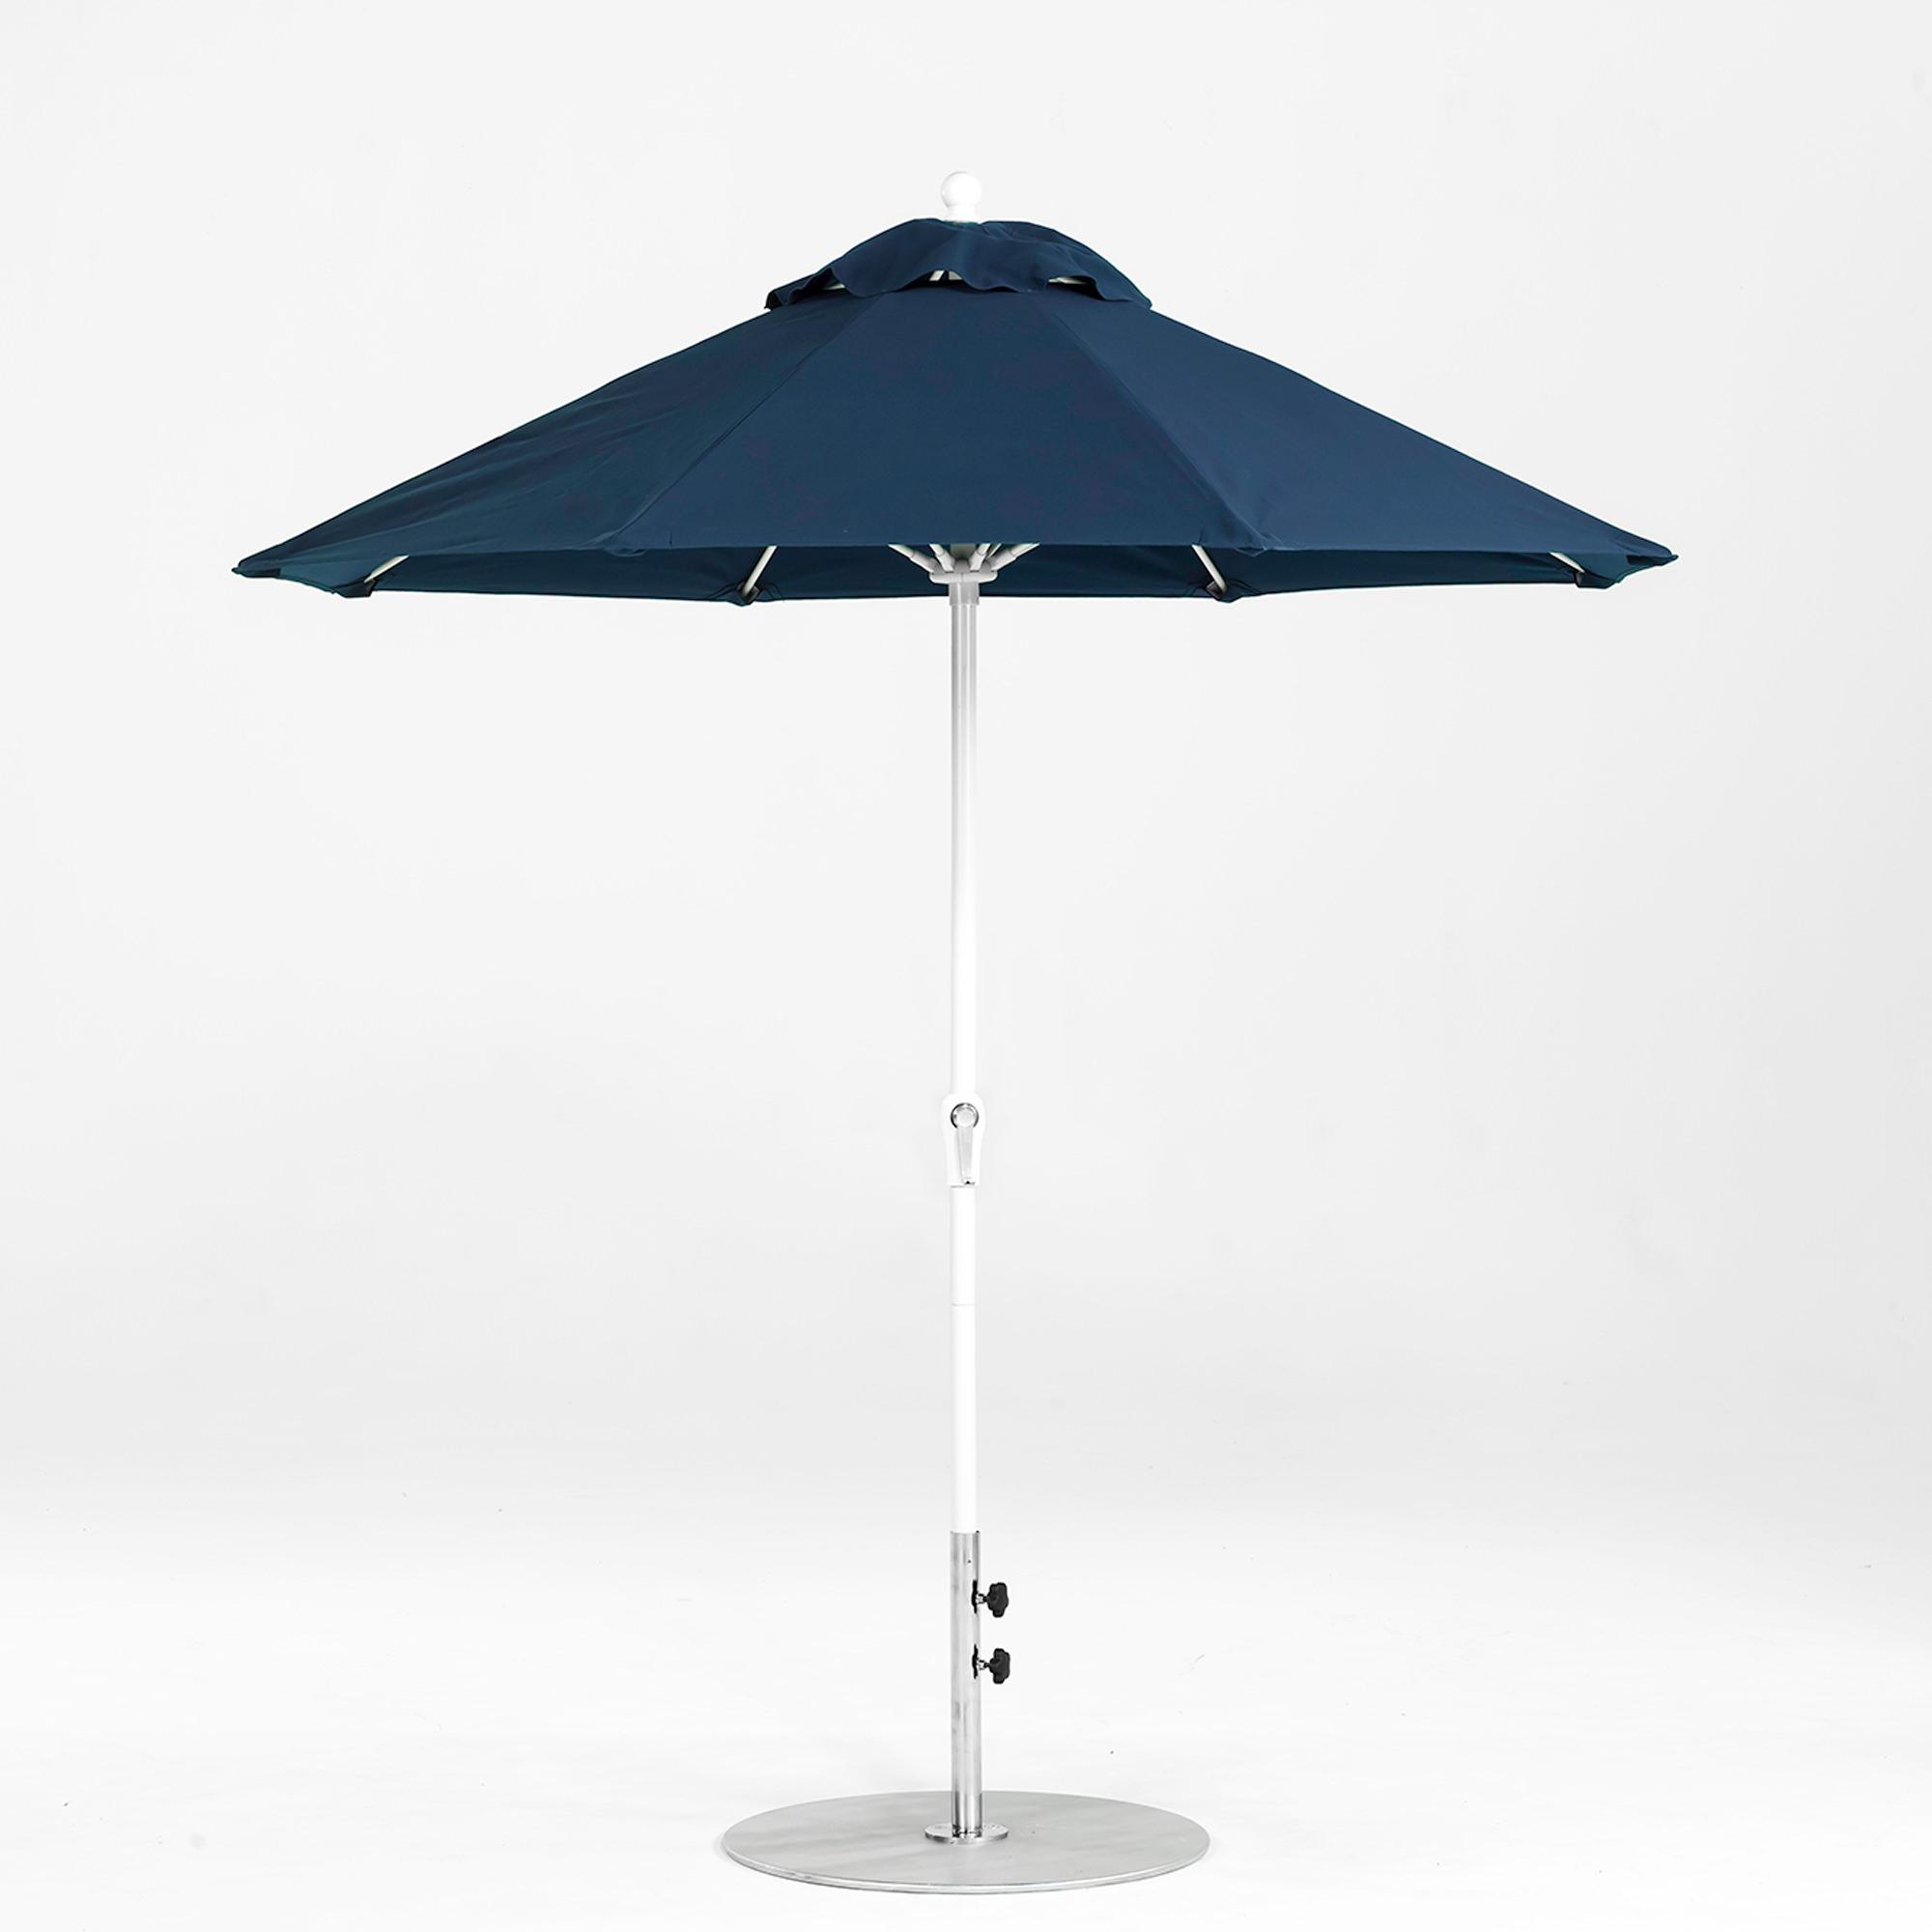 Market Umbrellas With Current 7.5 Ft. Crank Lift Fiberglass Market Umbrella With White Pole (Gallery 6 of 20)